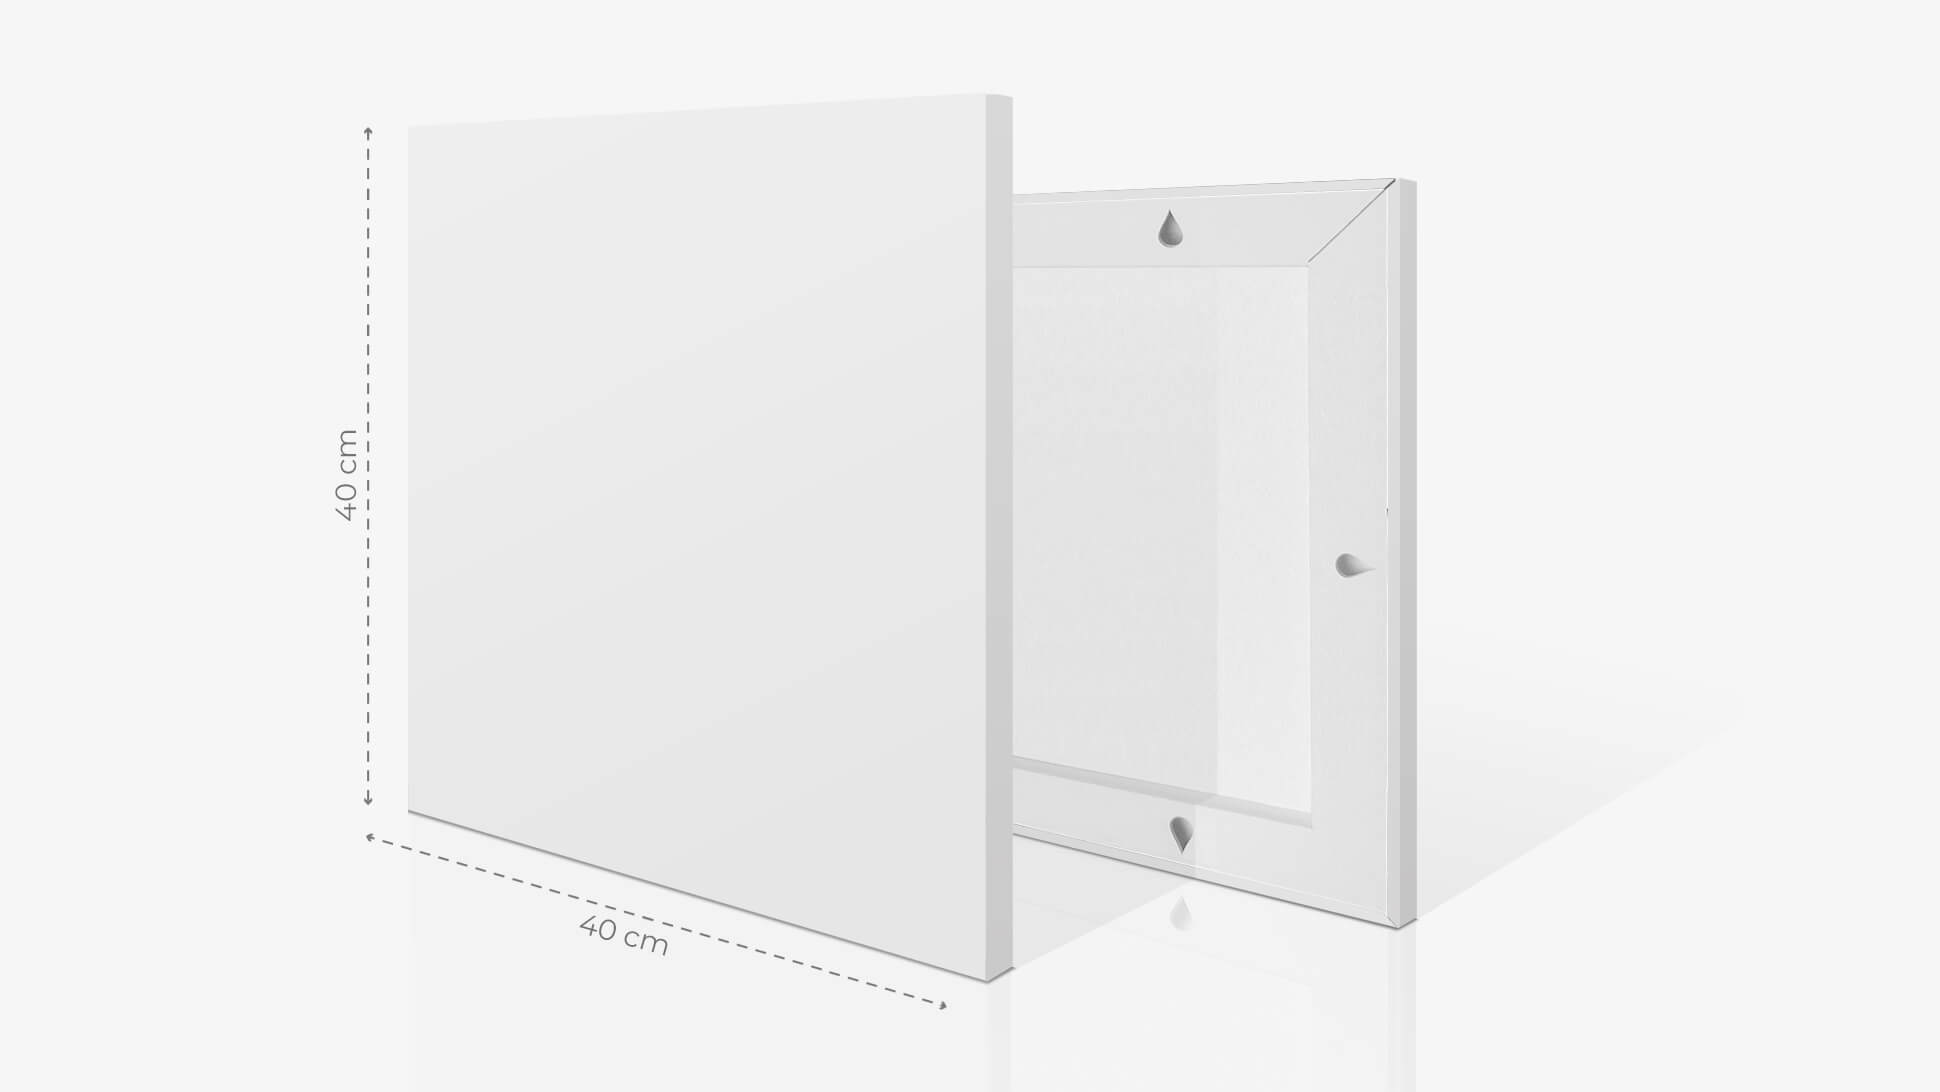 Fotoquadro 40x40 cm | tictac.it